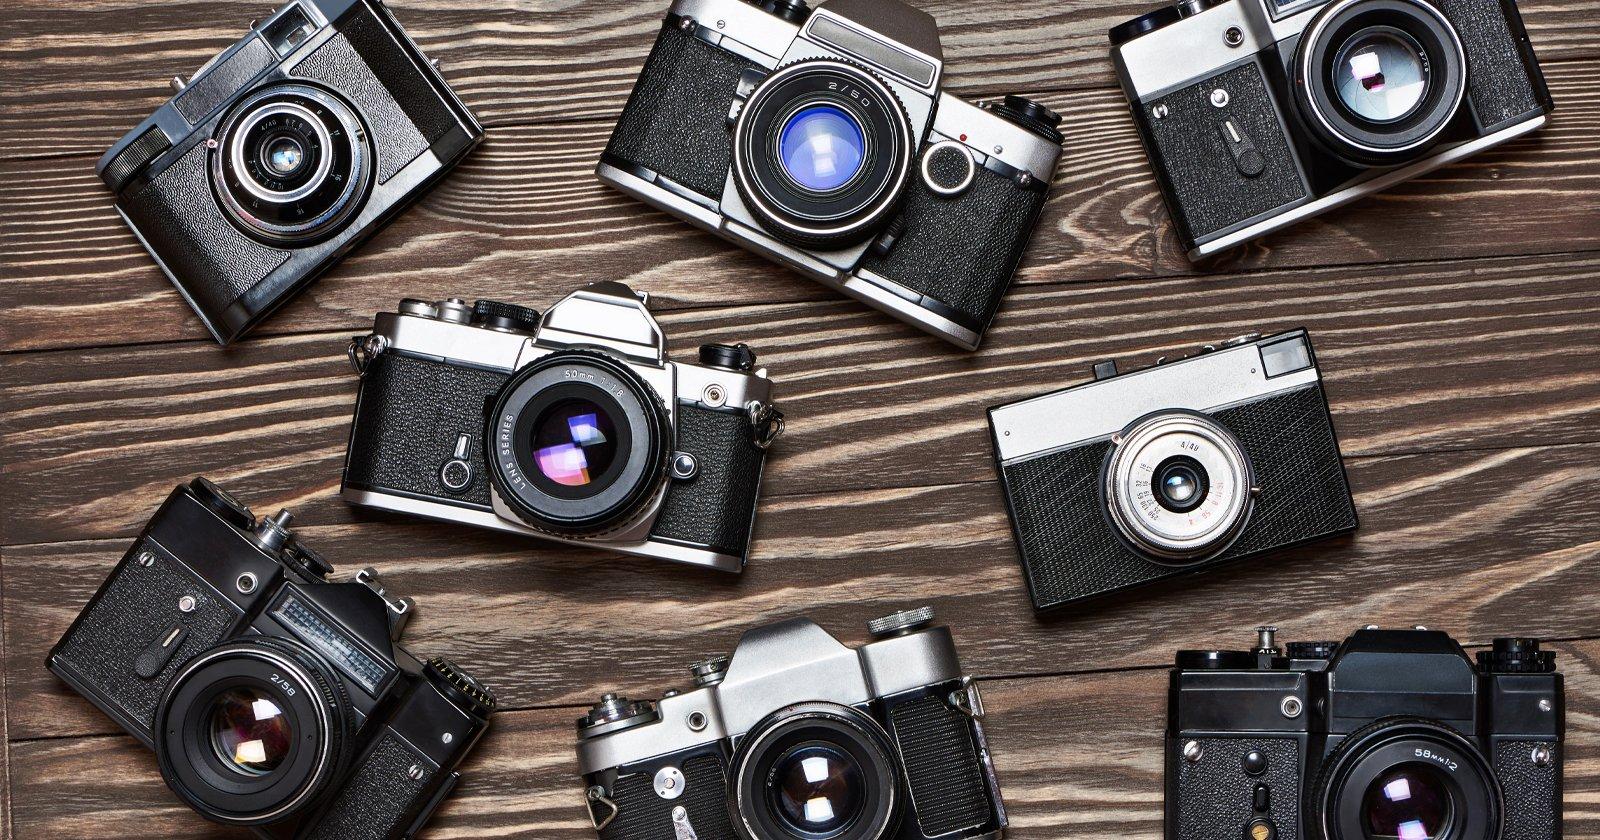 Three Ways We Can Keep Analog Photography Alive